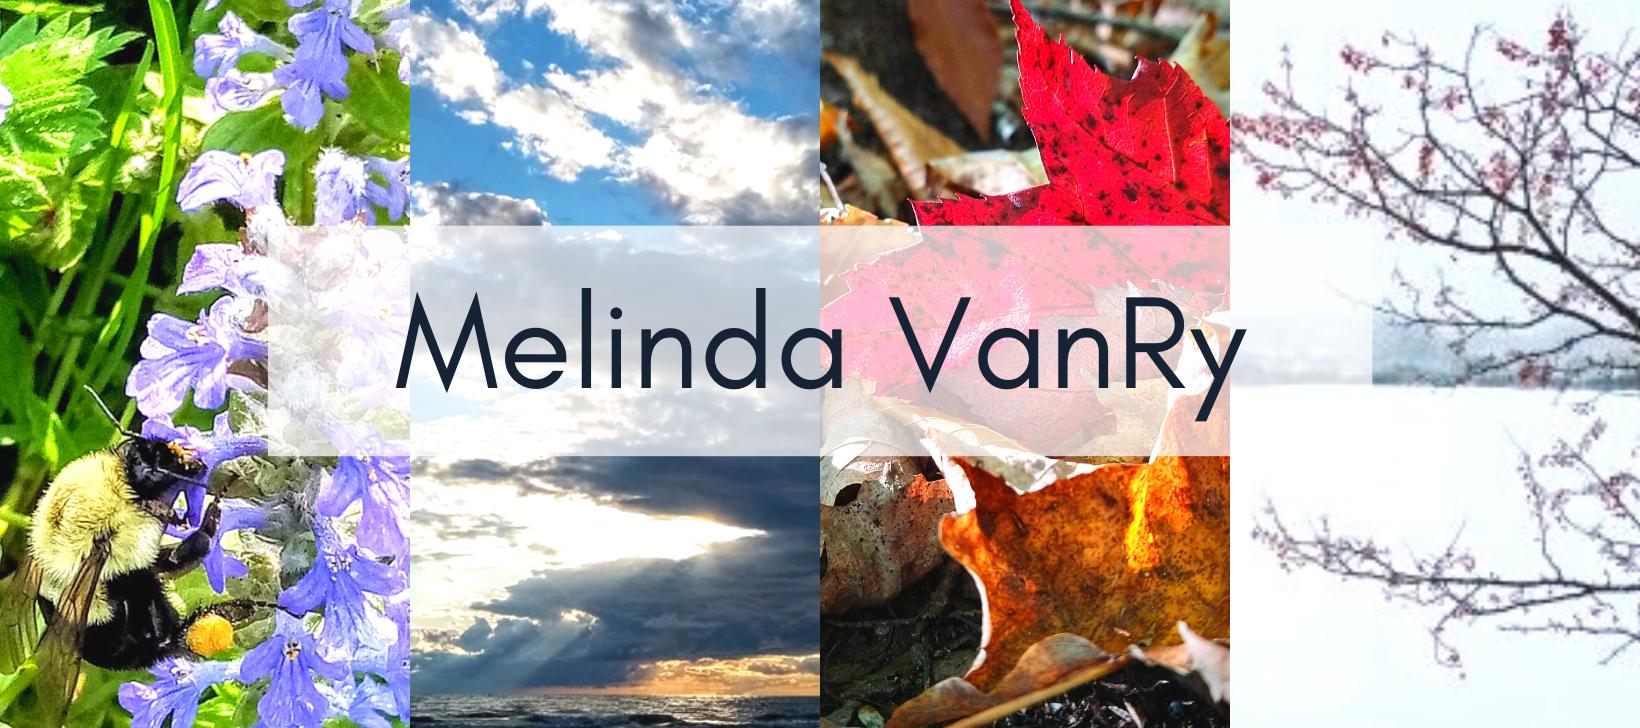 Melinda VanRy